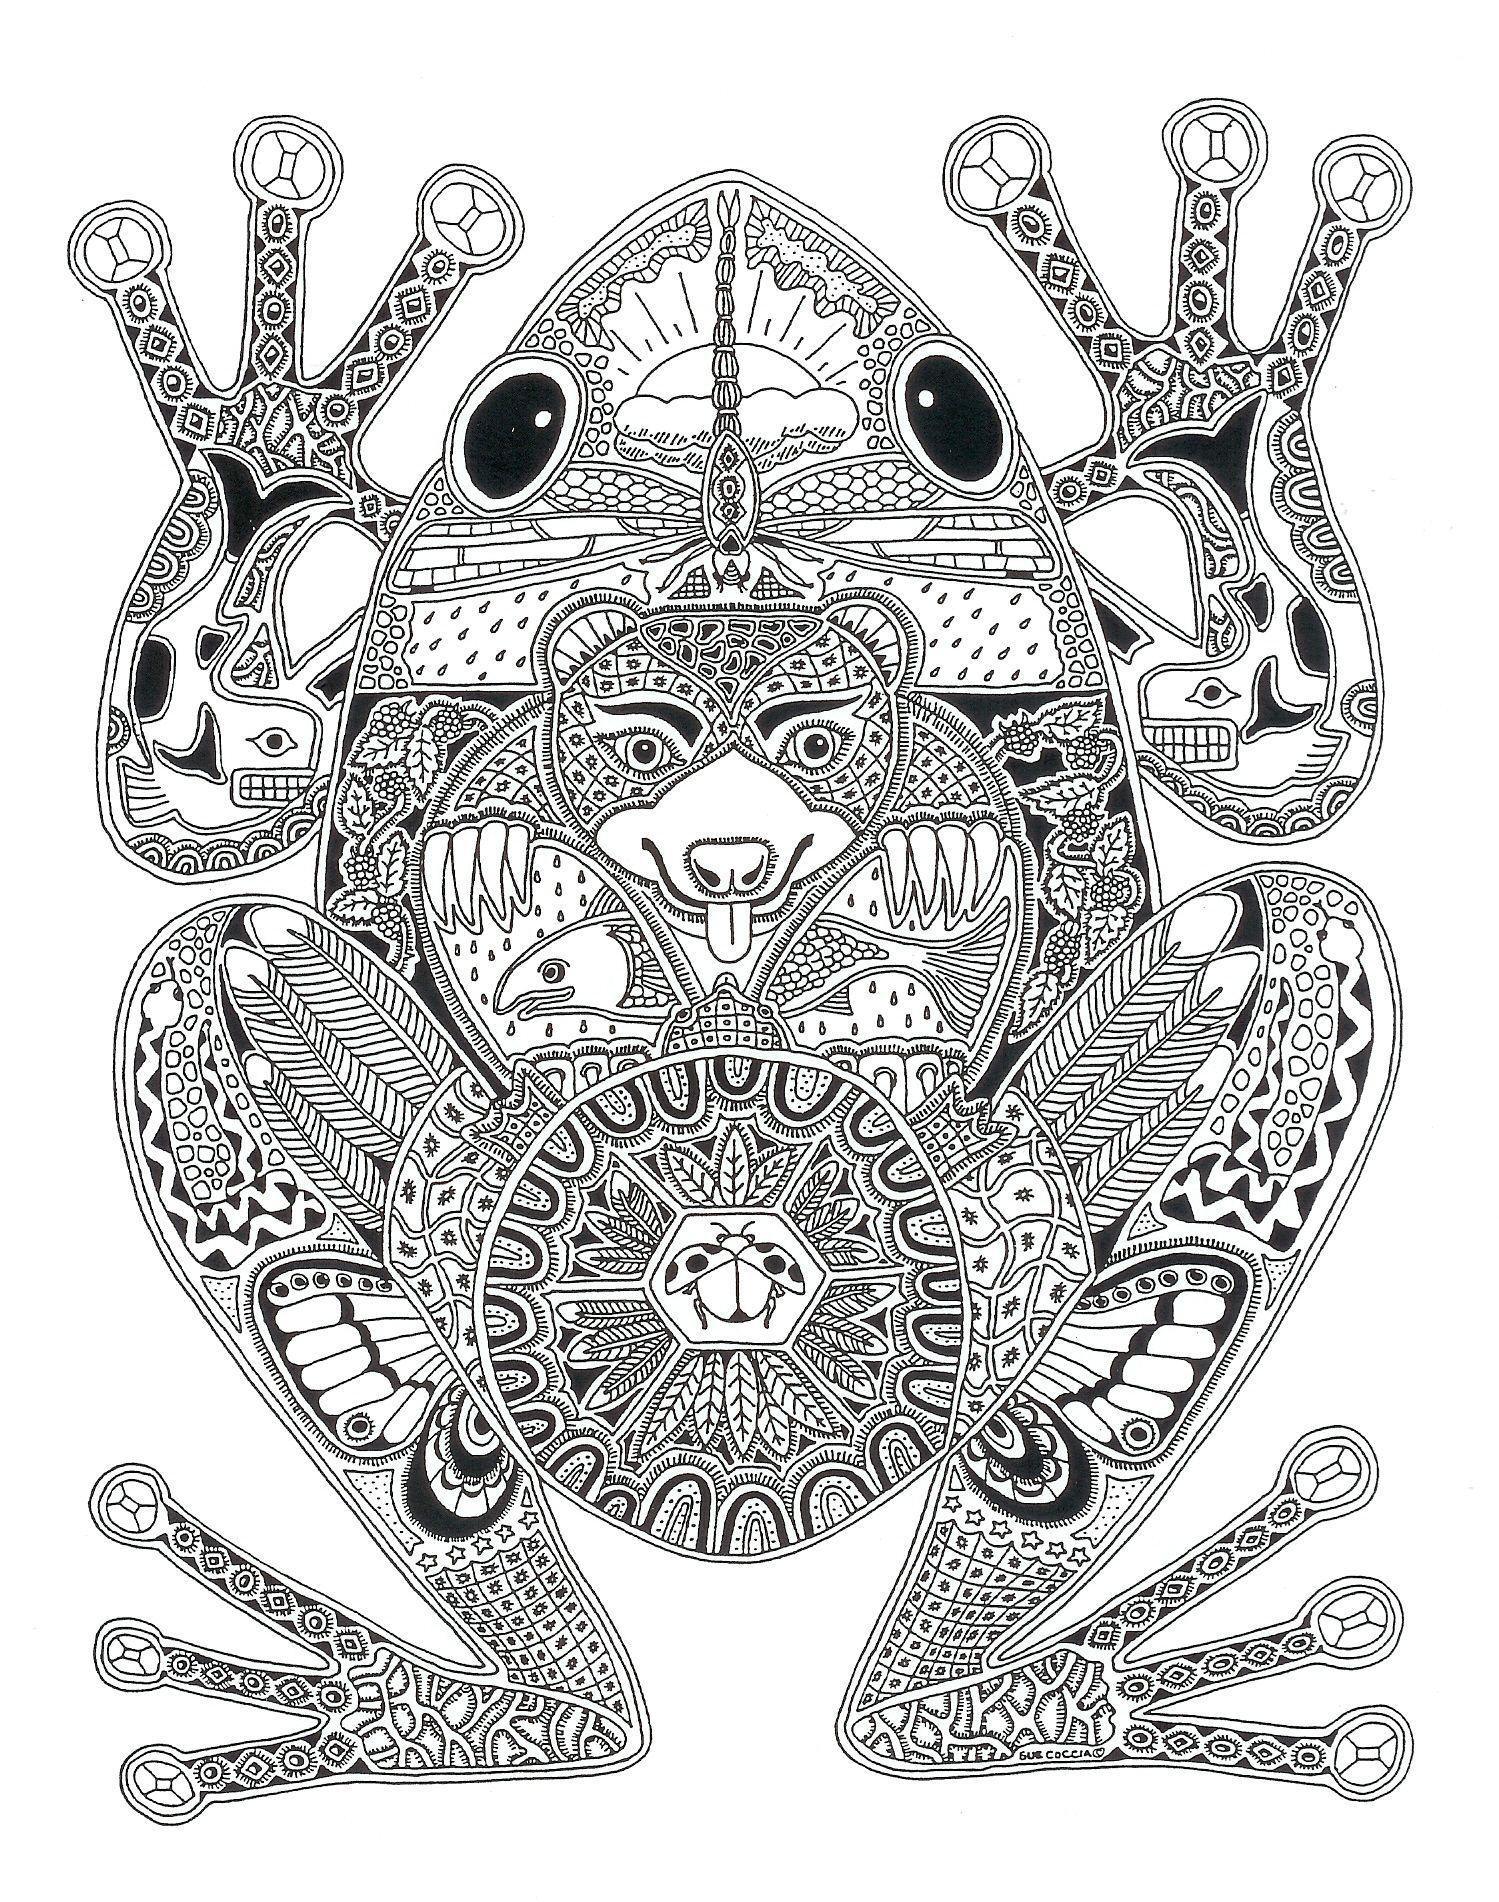 Pin de Jen M en Coloring book | Pinterest | Ranas, Mandalas y Dibujar